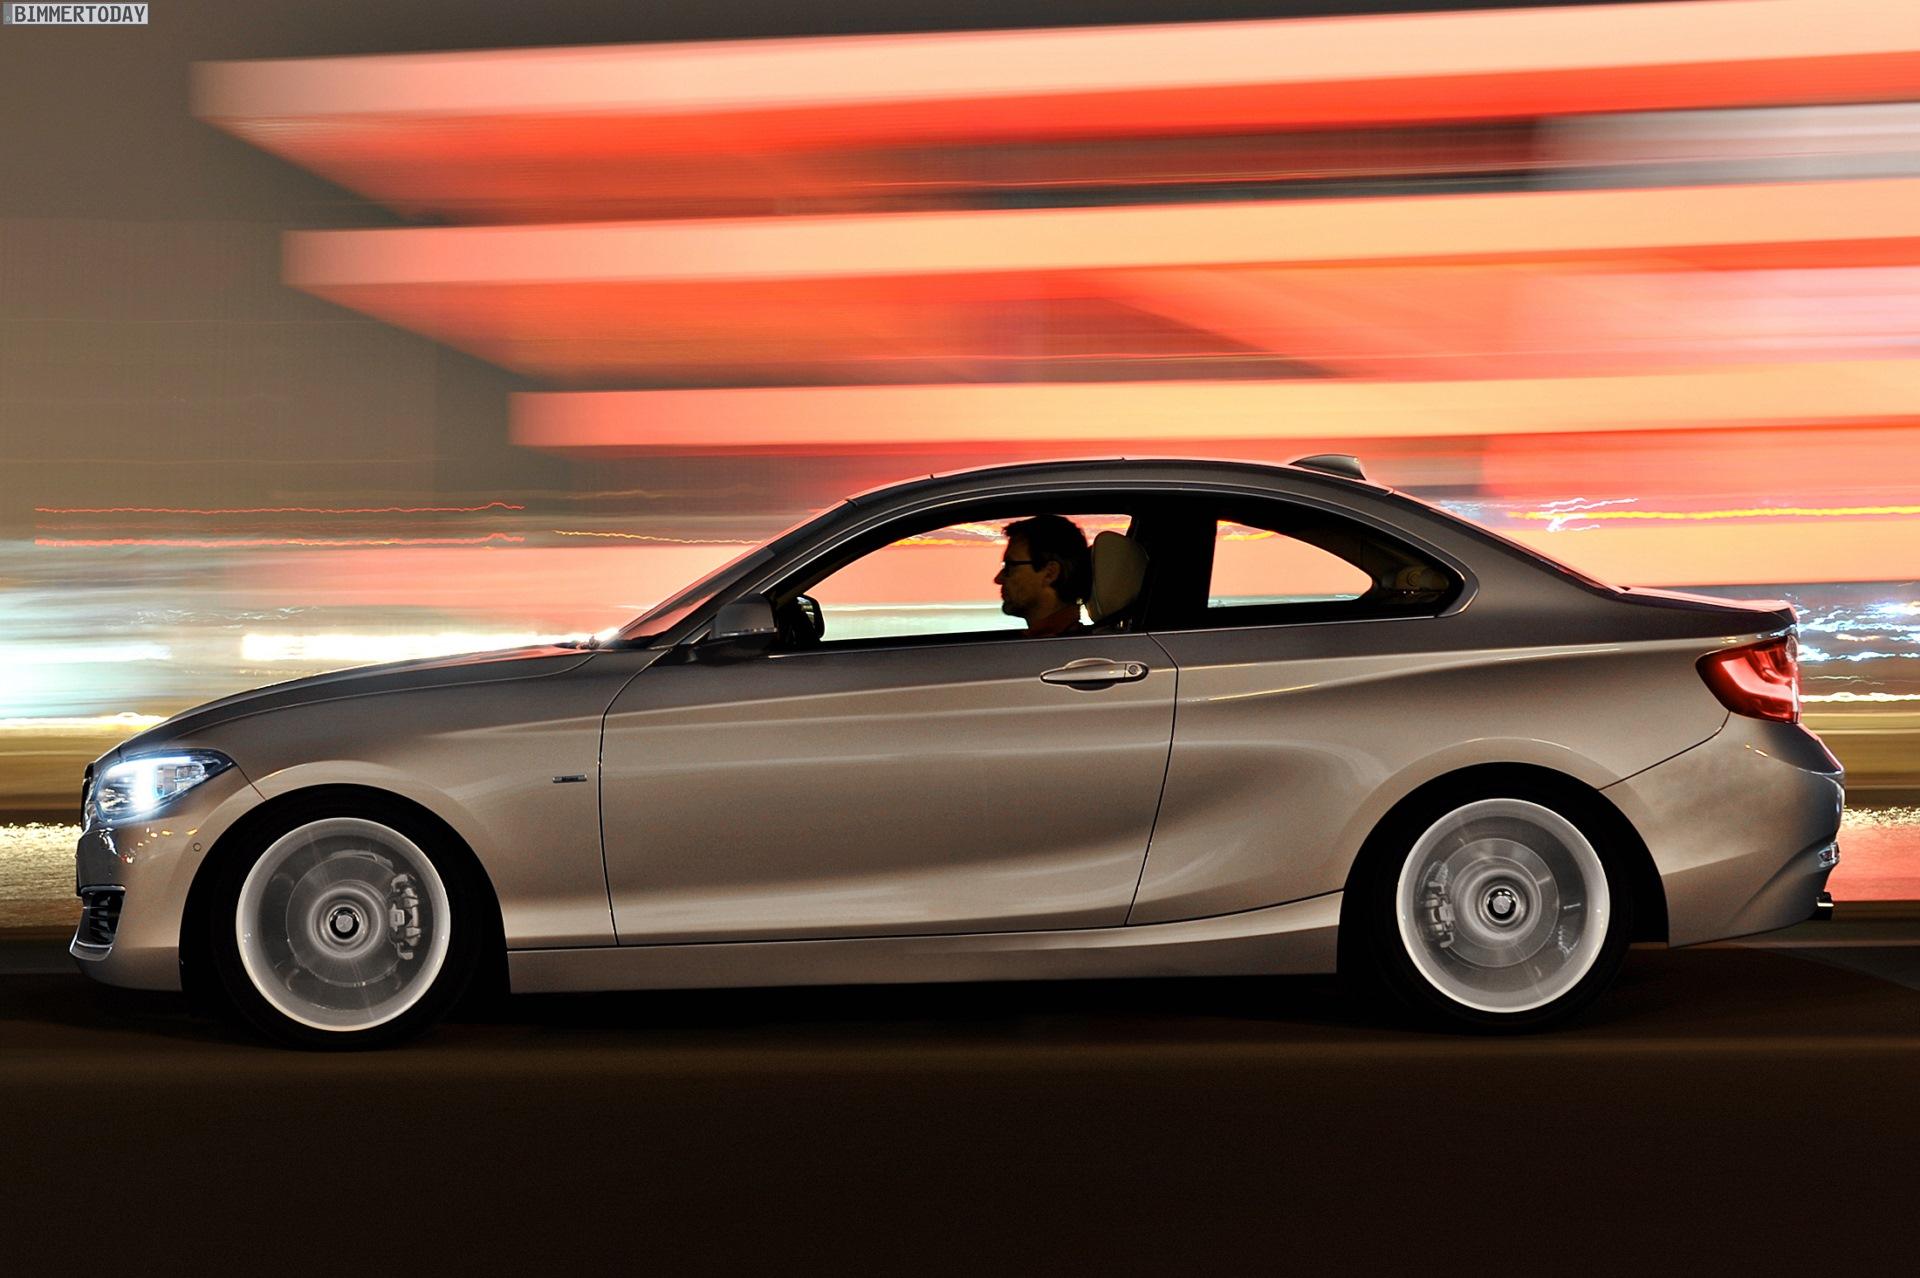 BMW 2er #9 - high quality BMW 2er pictures on MotorInfo.org